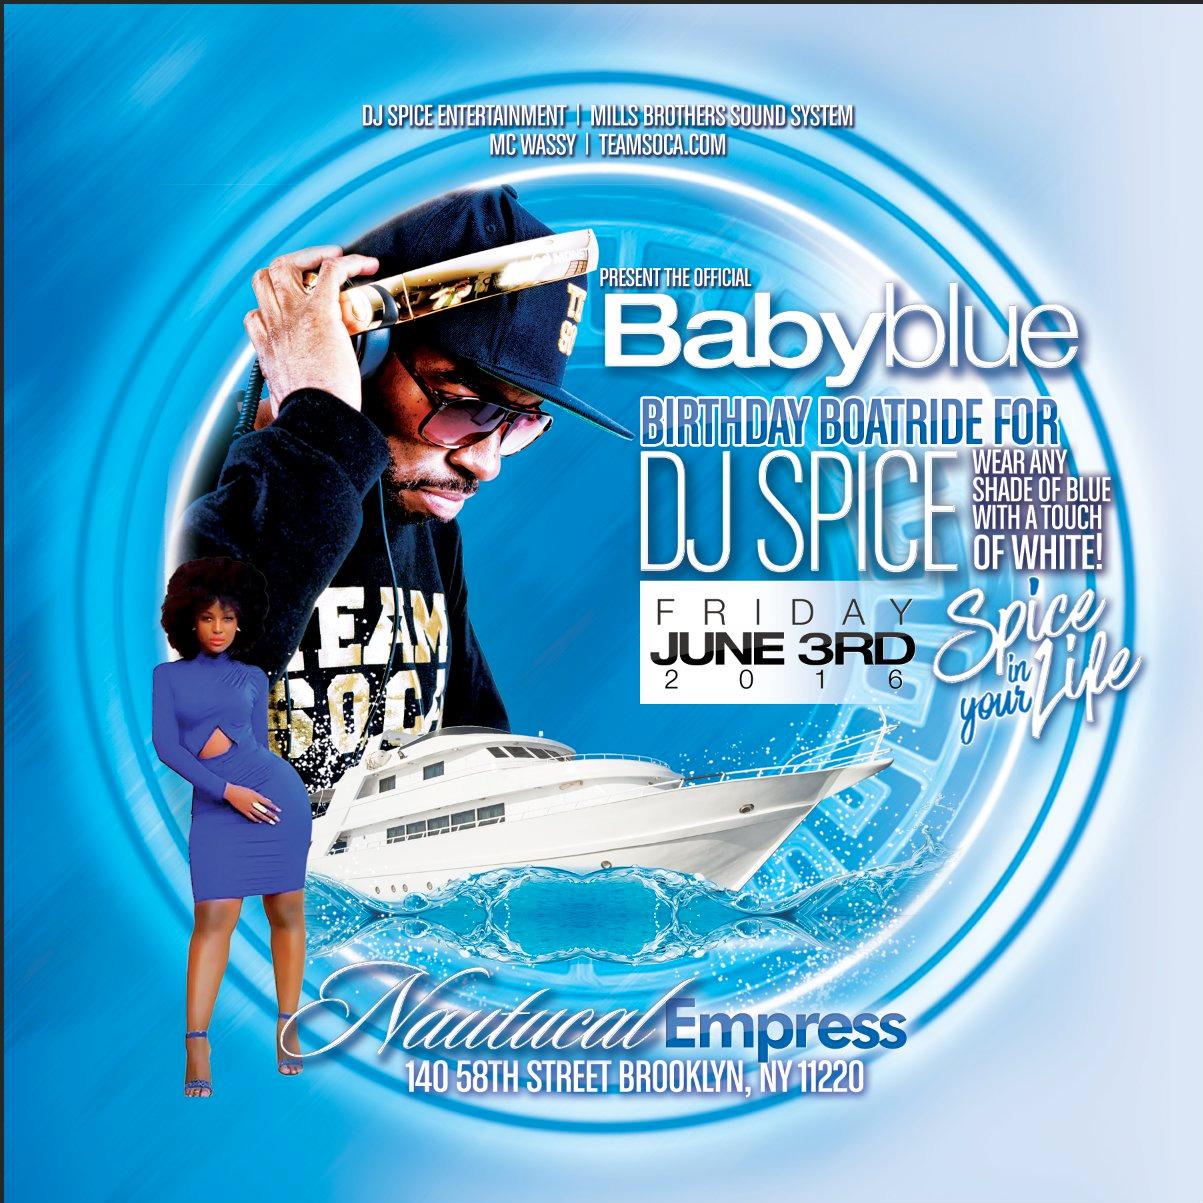 Baby Blue Birthday Boatride for DJ Spice